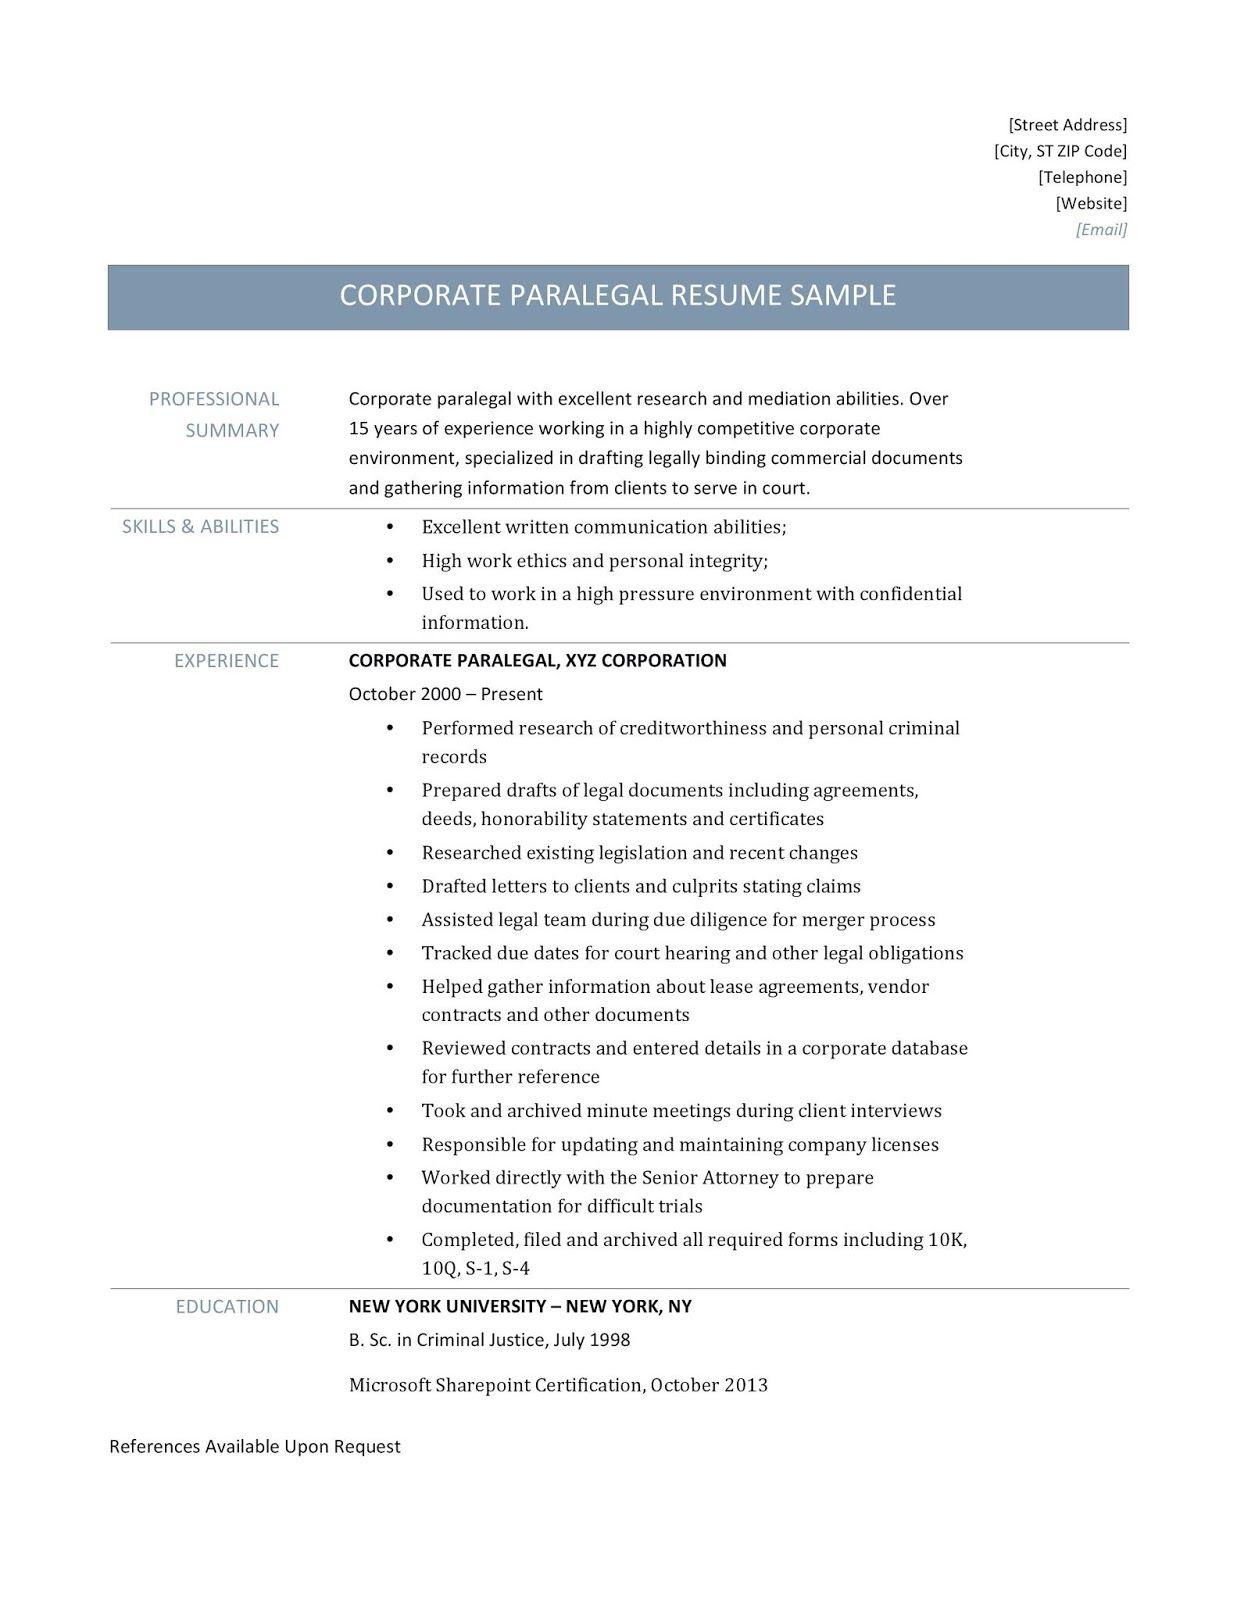 paralegal resume sample, paralegal resume samples